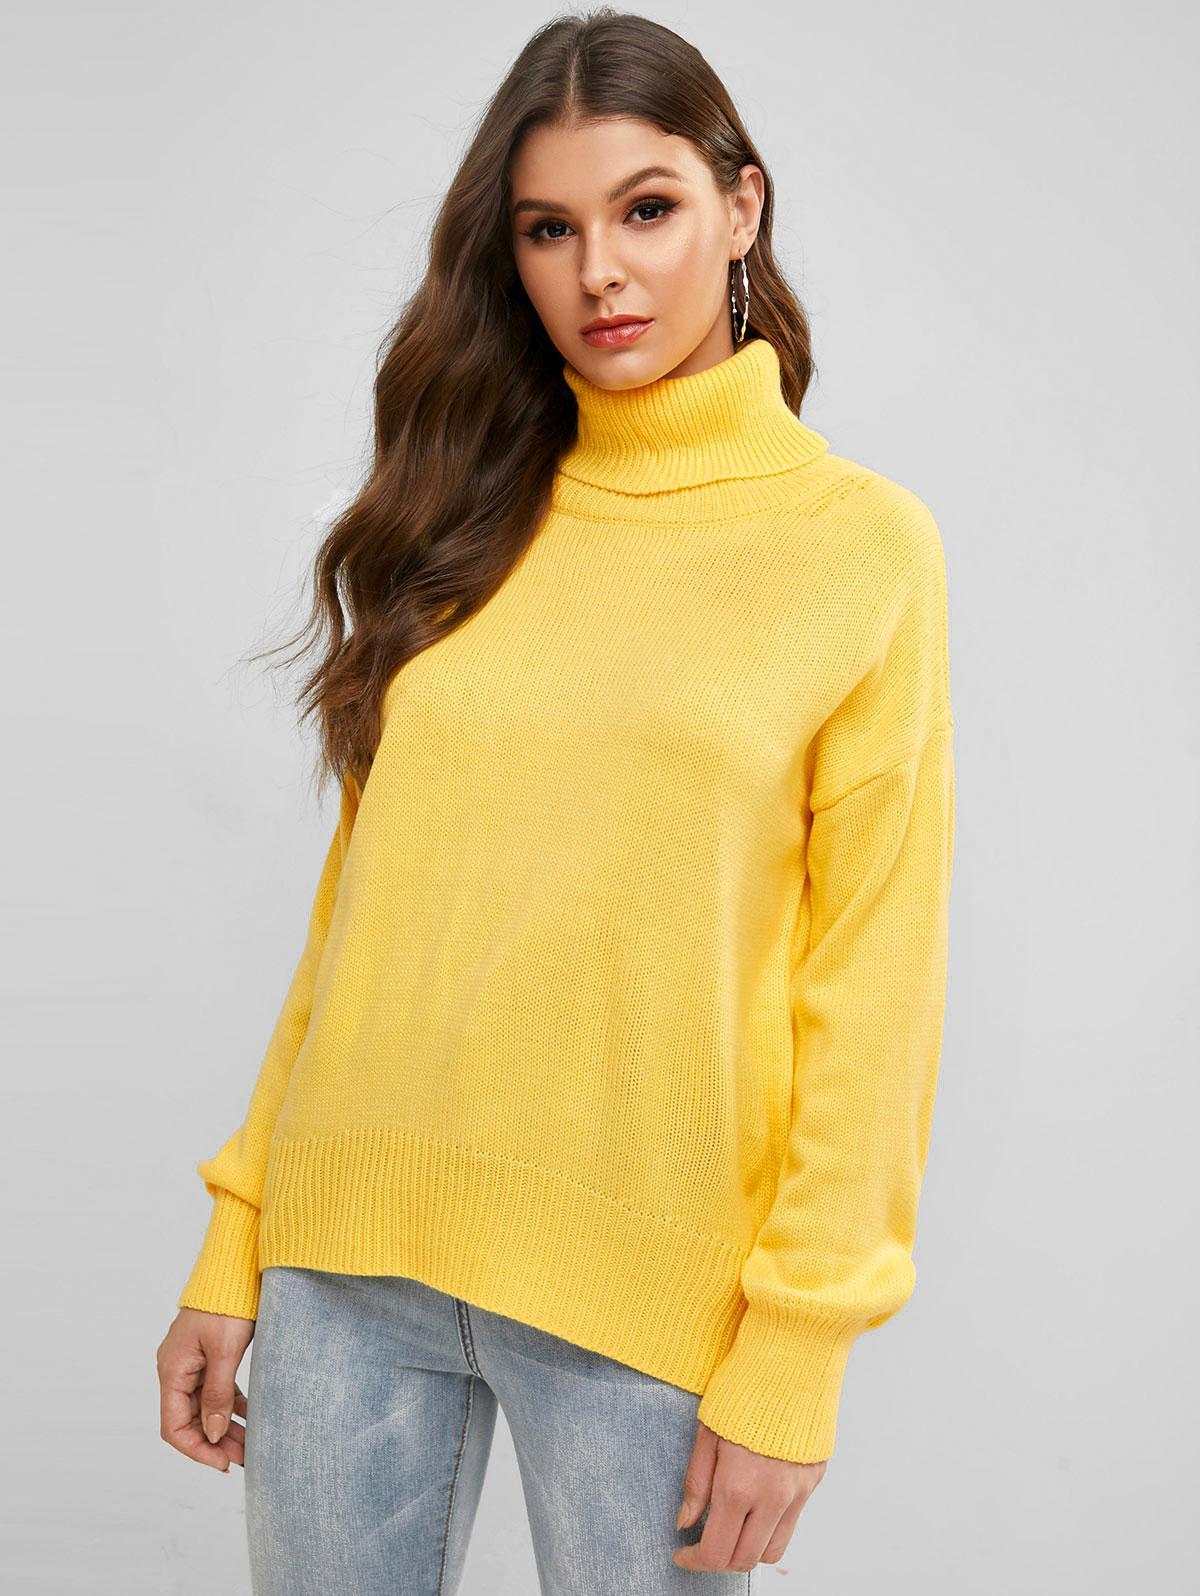 Turtleneck Plain Drop Shoulder Sweater